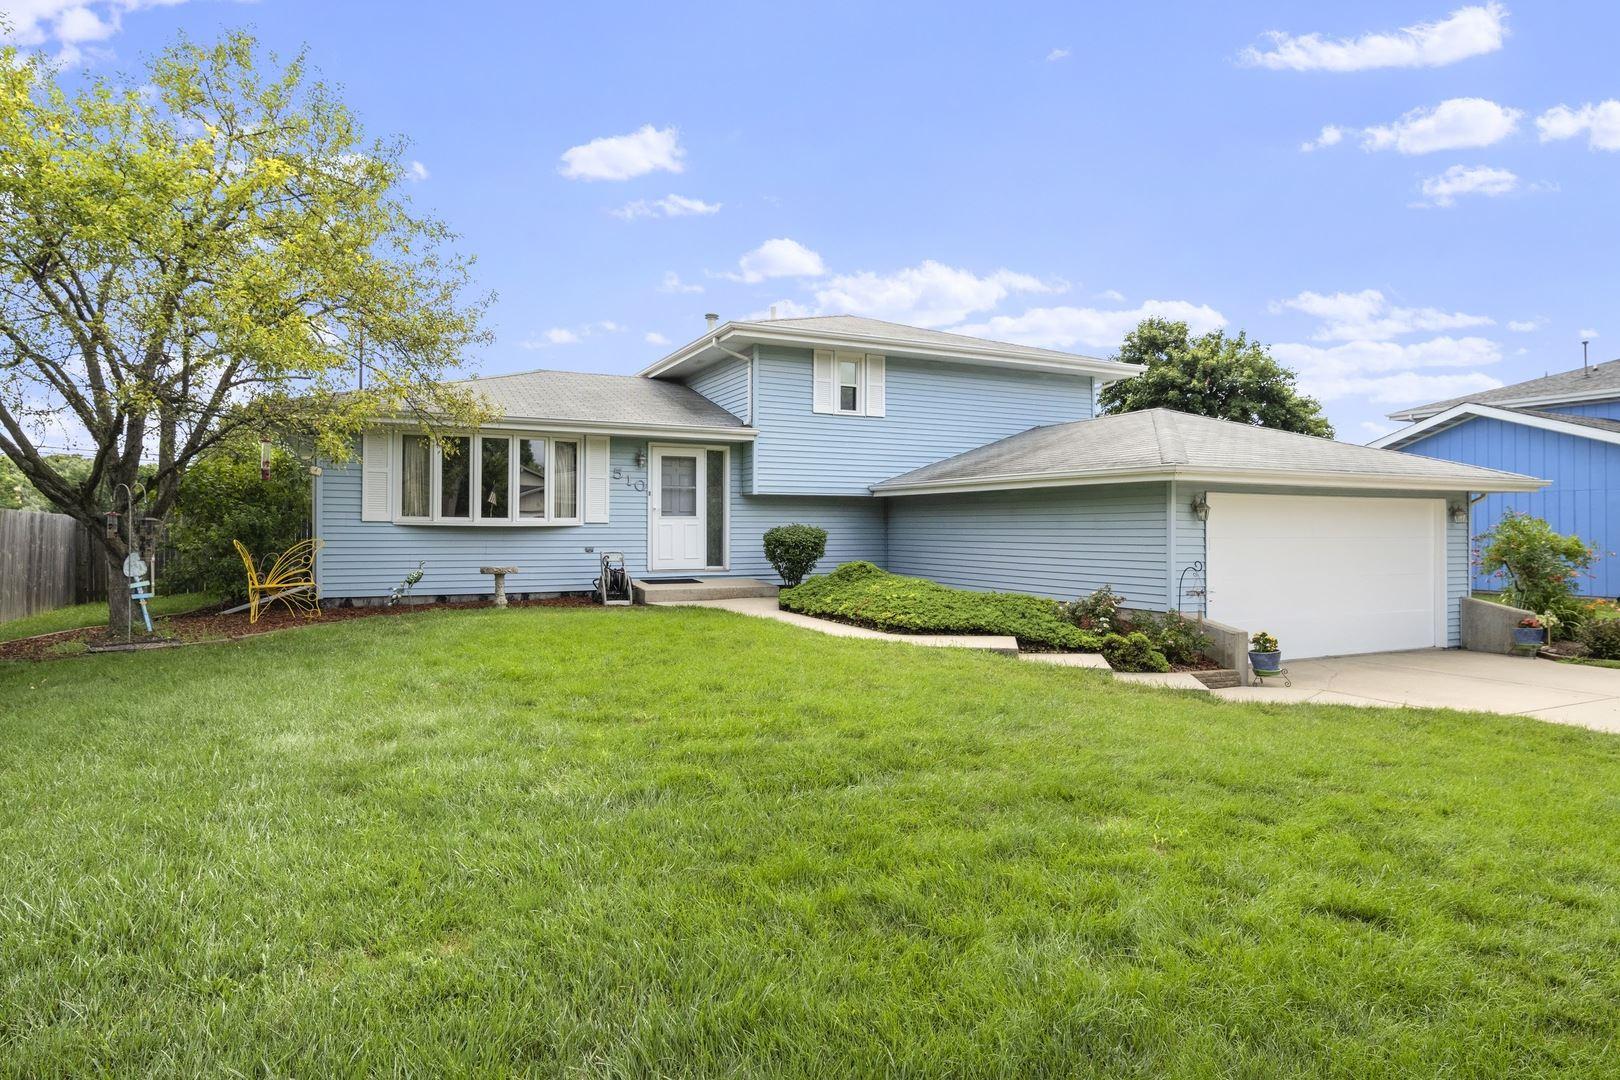 510 Sean Drive, Shorewood, IL 60404 - #: 10793013